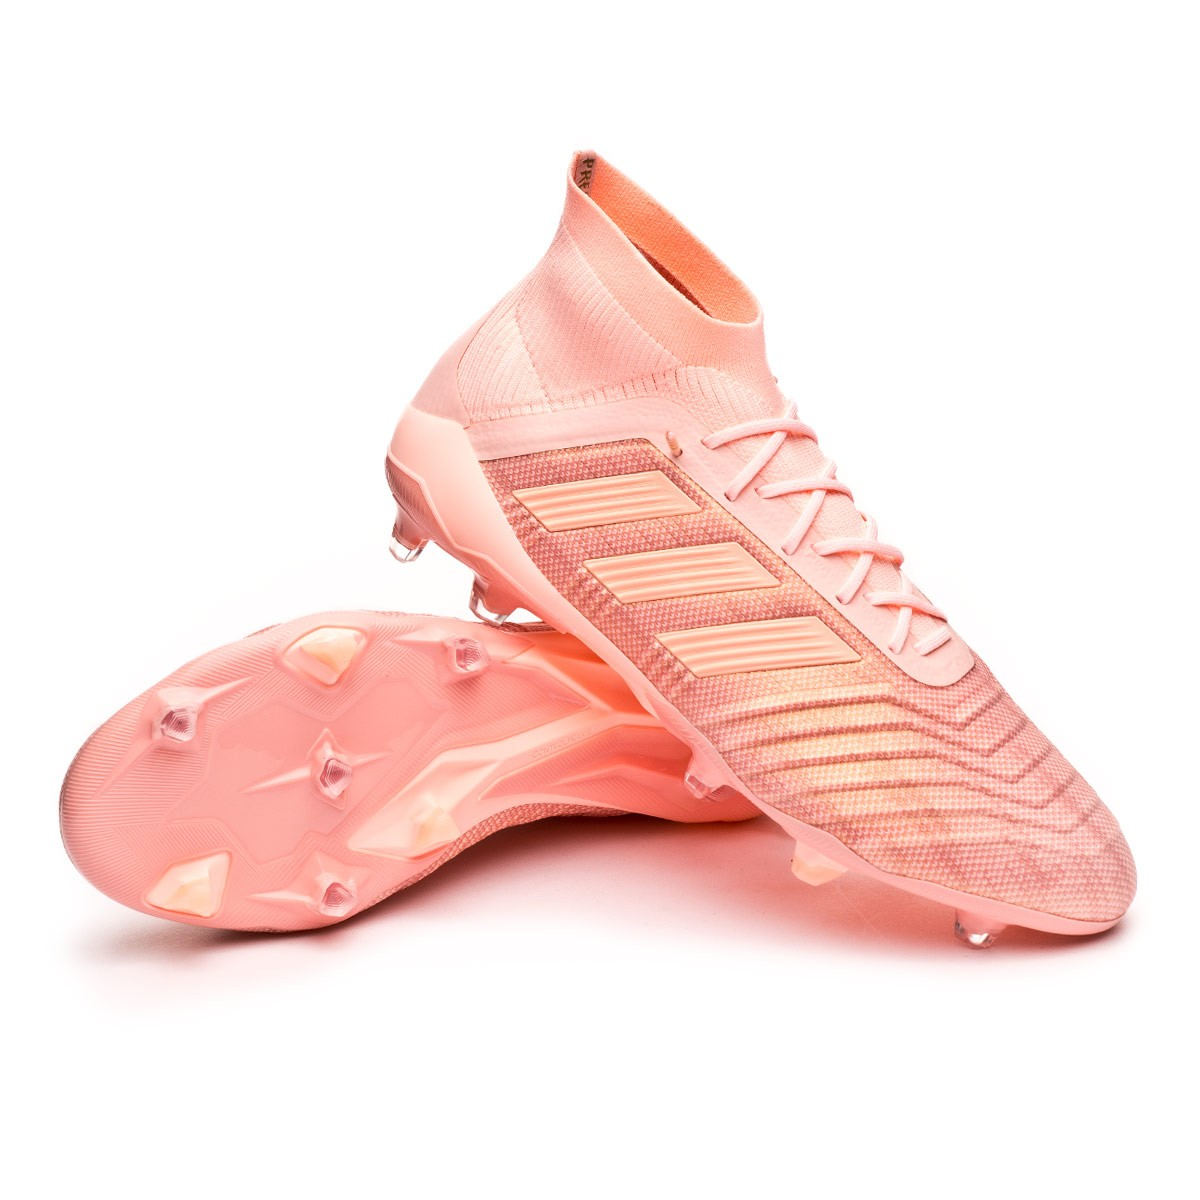 57b8cf03bf4 adidas Predator 18.1 FG Football Boots. Clear orange-Trace pink ...